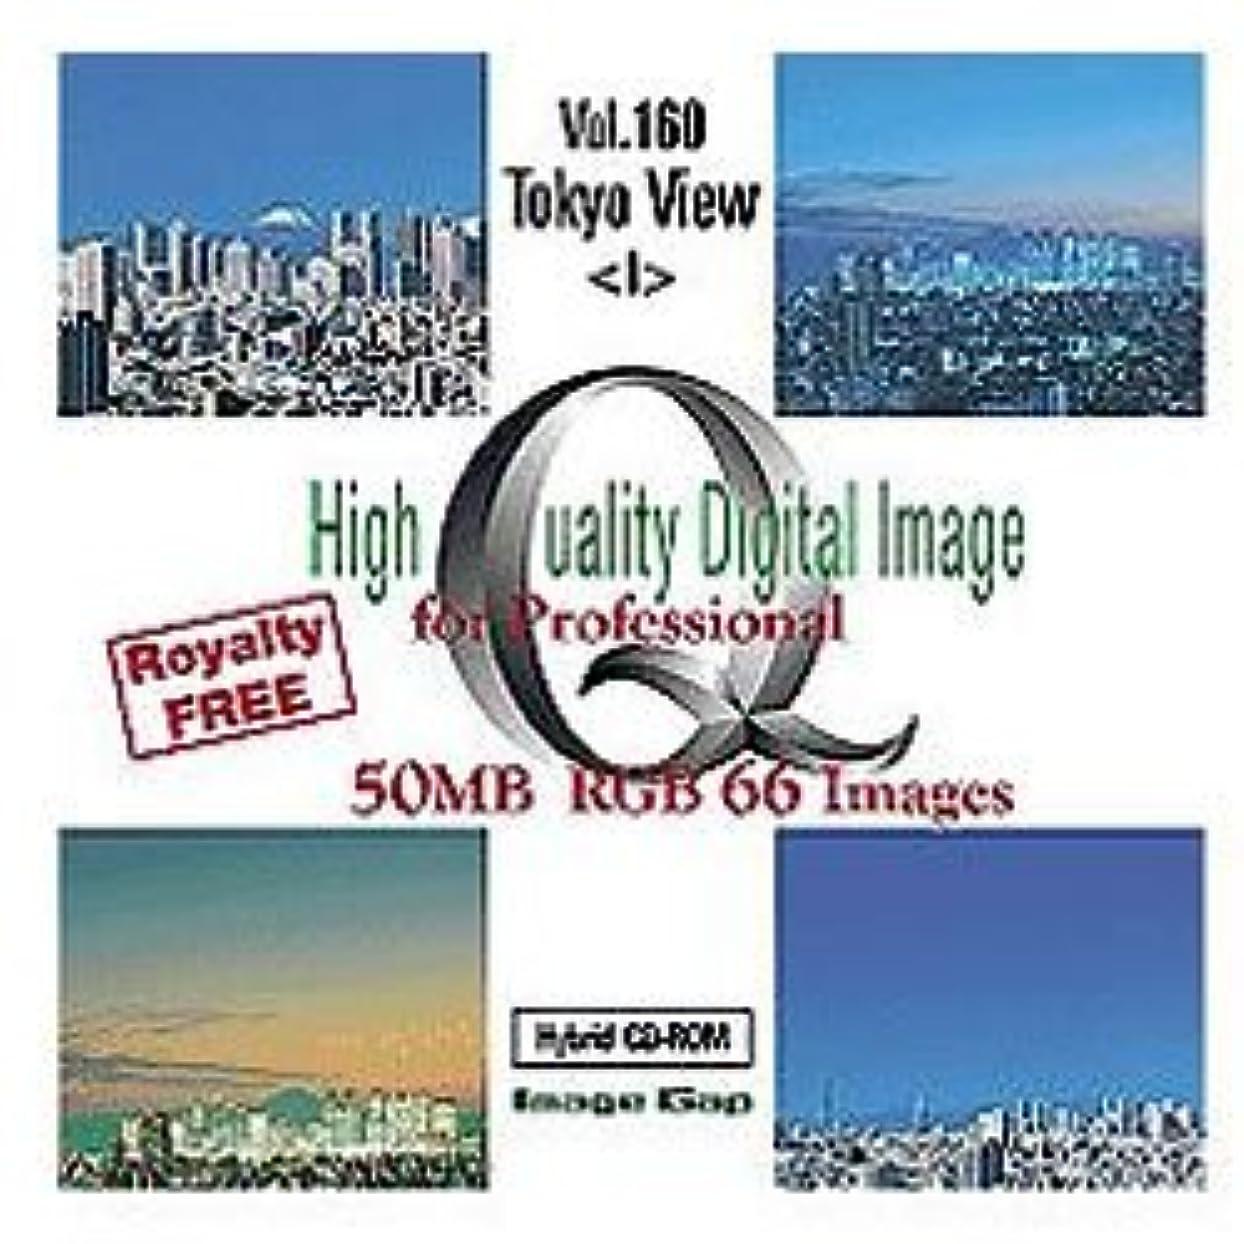 High Quality Digital Image Tokyo View <1>